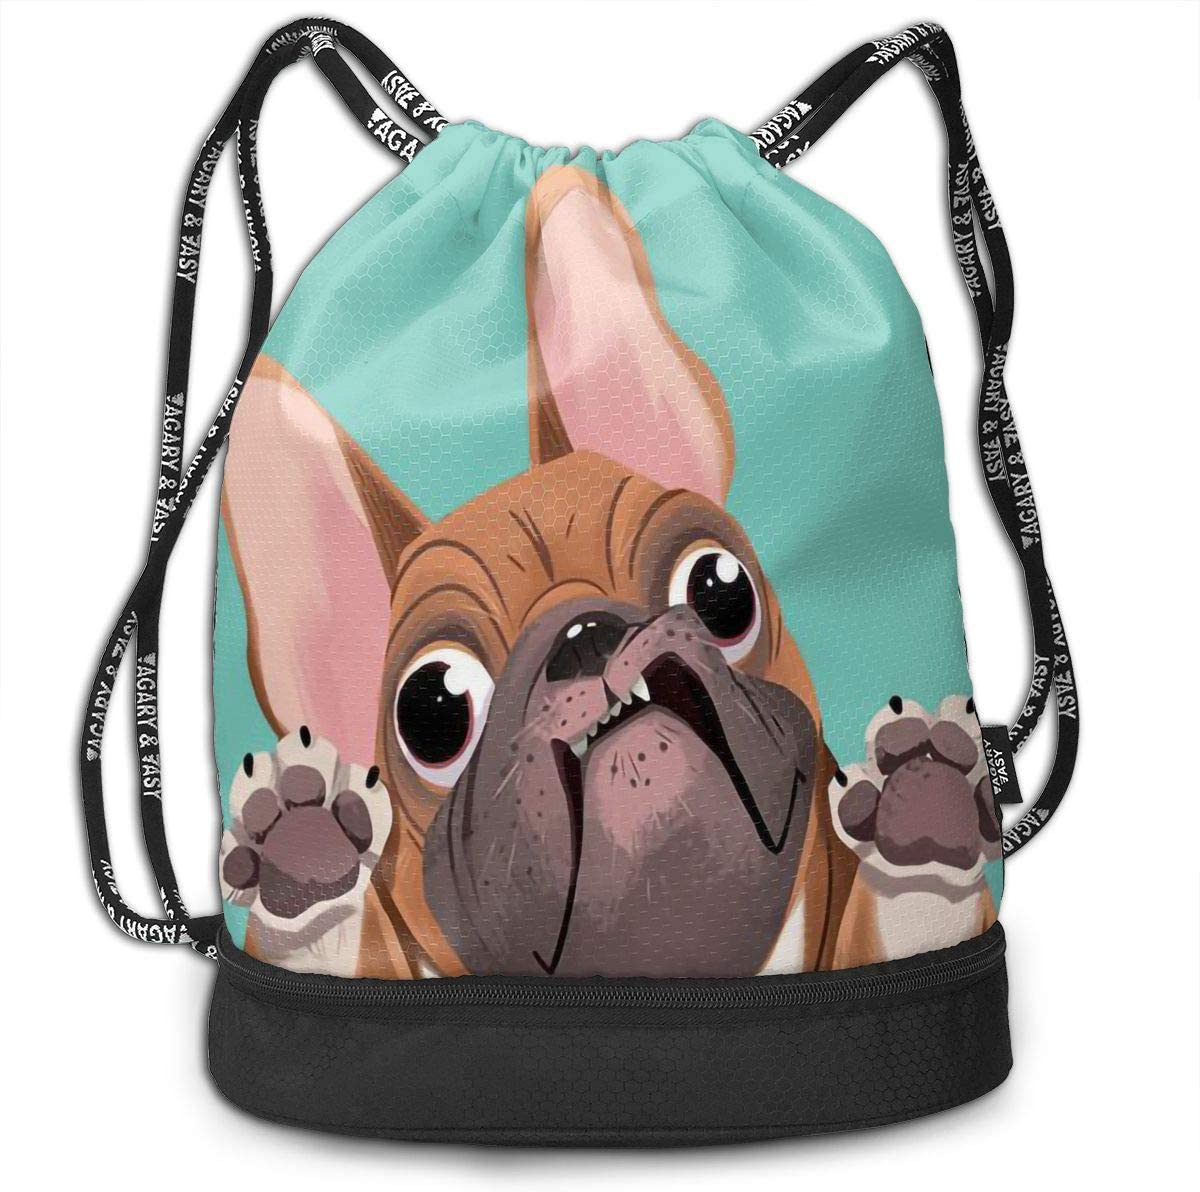 Drawstring Backpack Bulldog Puppy Dog Gym Bag